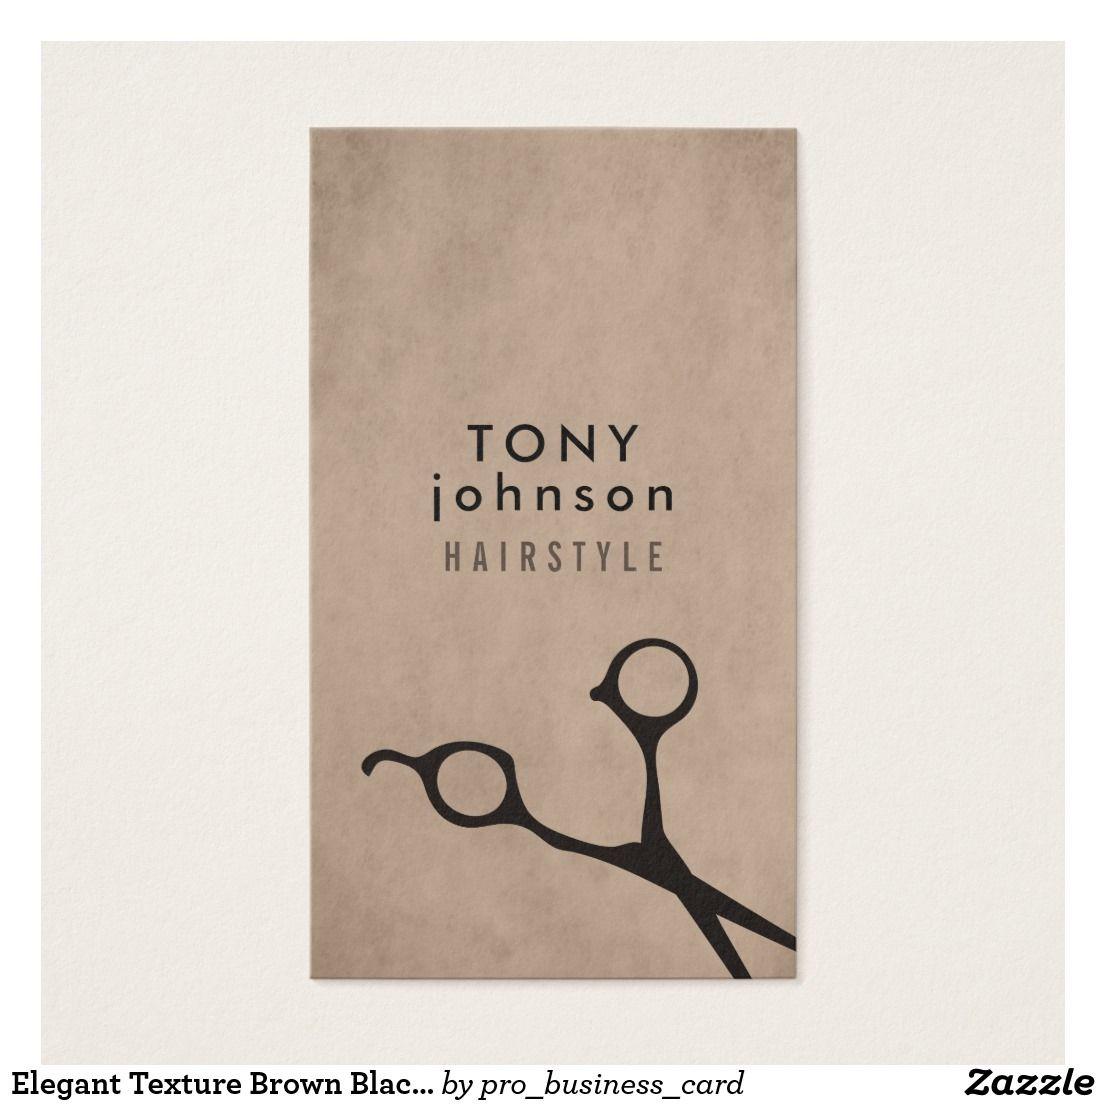 Elegant Texture Brown Black Scissors Hair Stylist   Business Cards ...